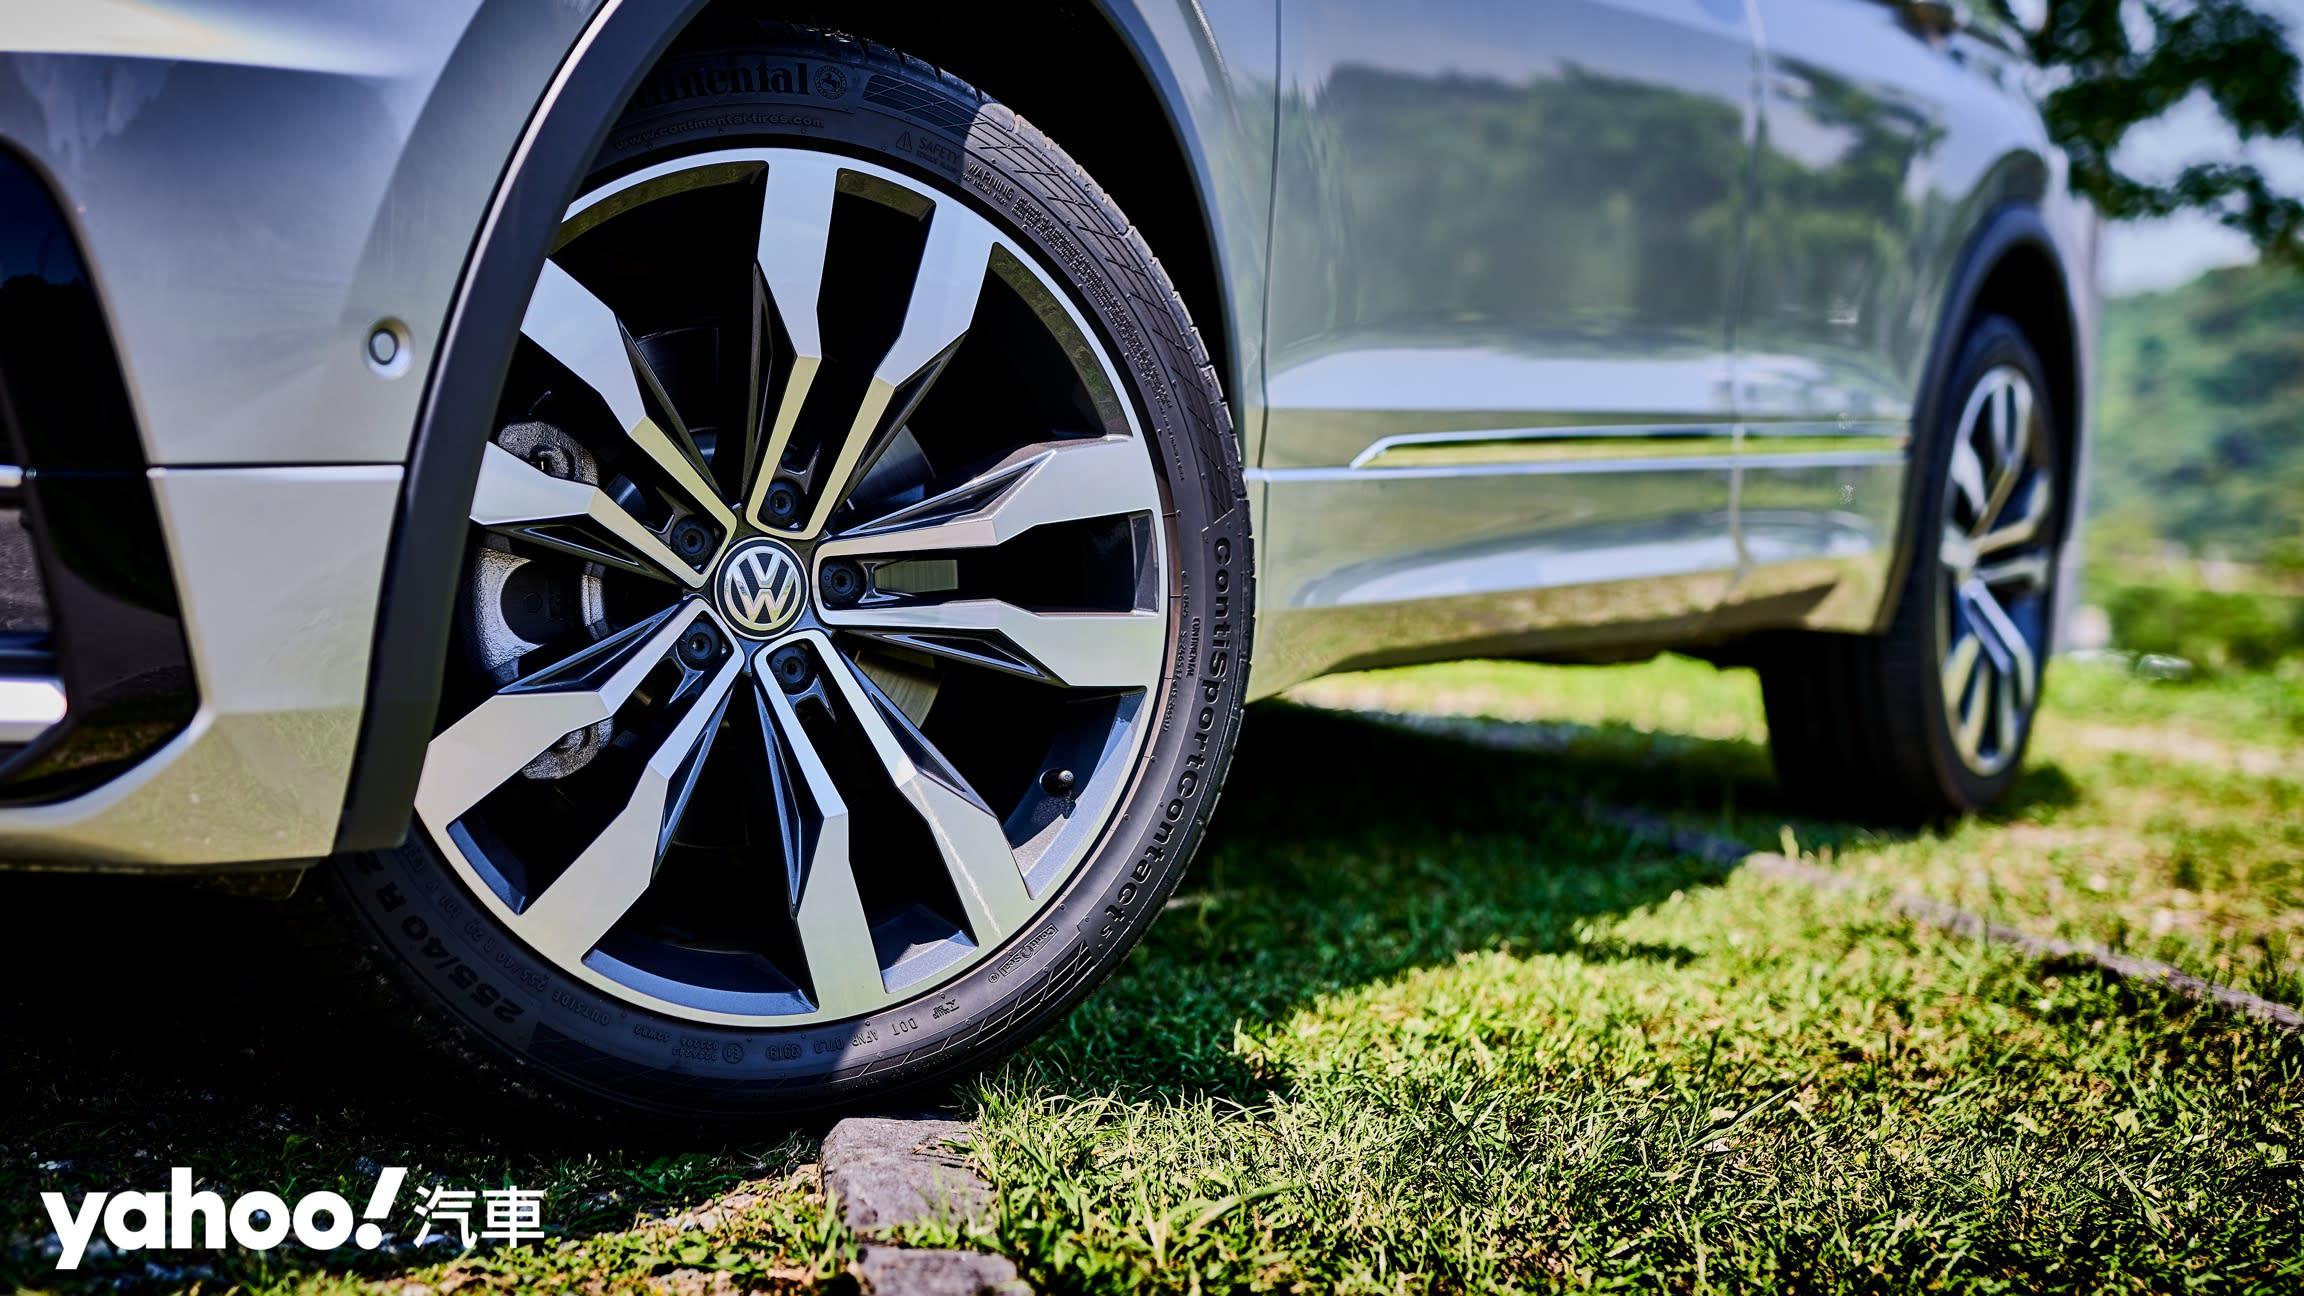 剛柔並濟所以值得!2020 Volkswagen Tiguan 380TSI R-Line Performance城郊試駕! - 7